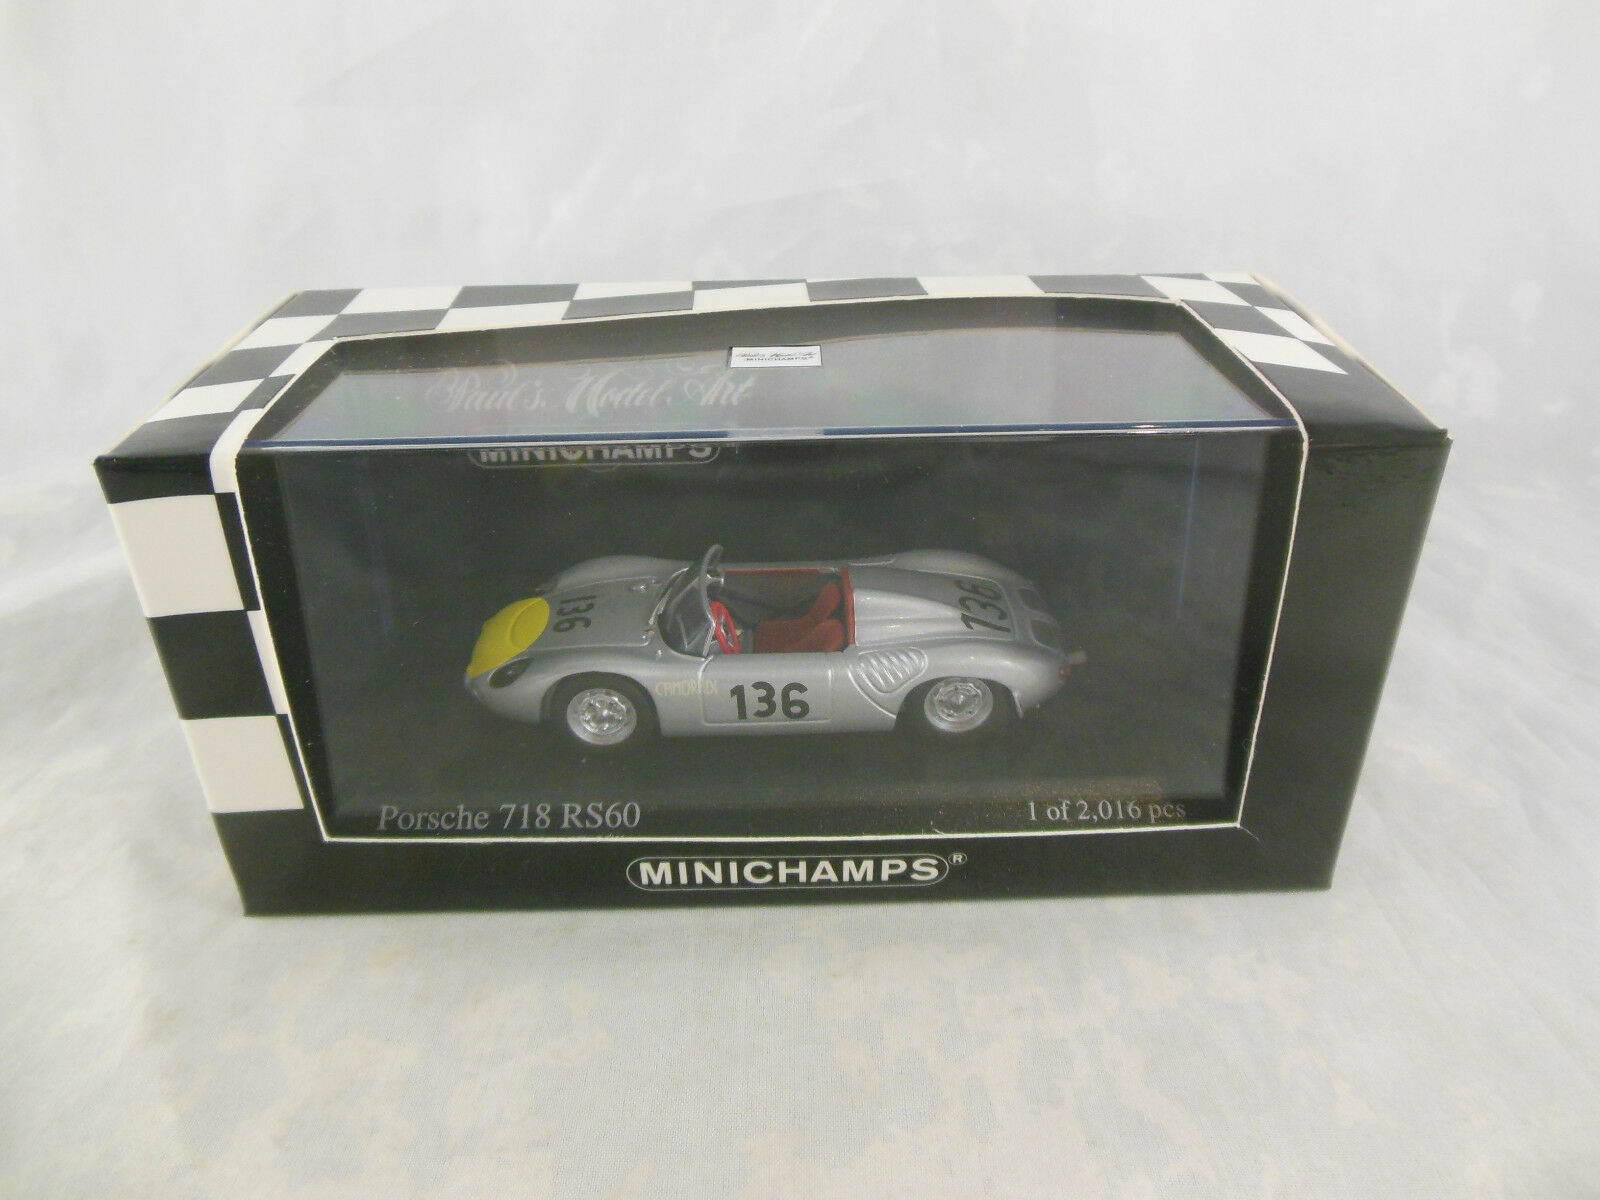 Scarse Minichamps 430 616896 PORSCHE 718 RS60 TARGA FLORIO 1961 Ltd Edition